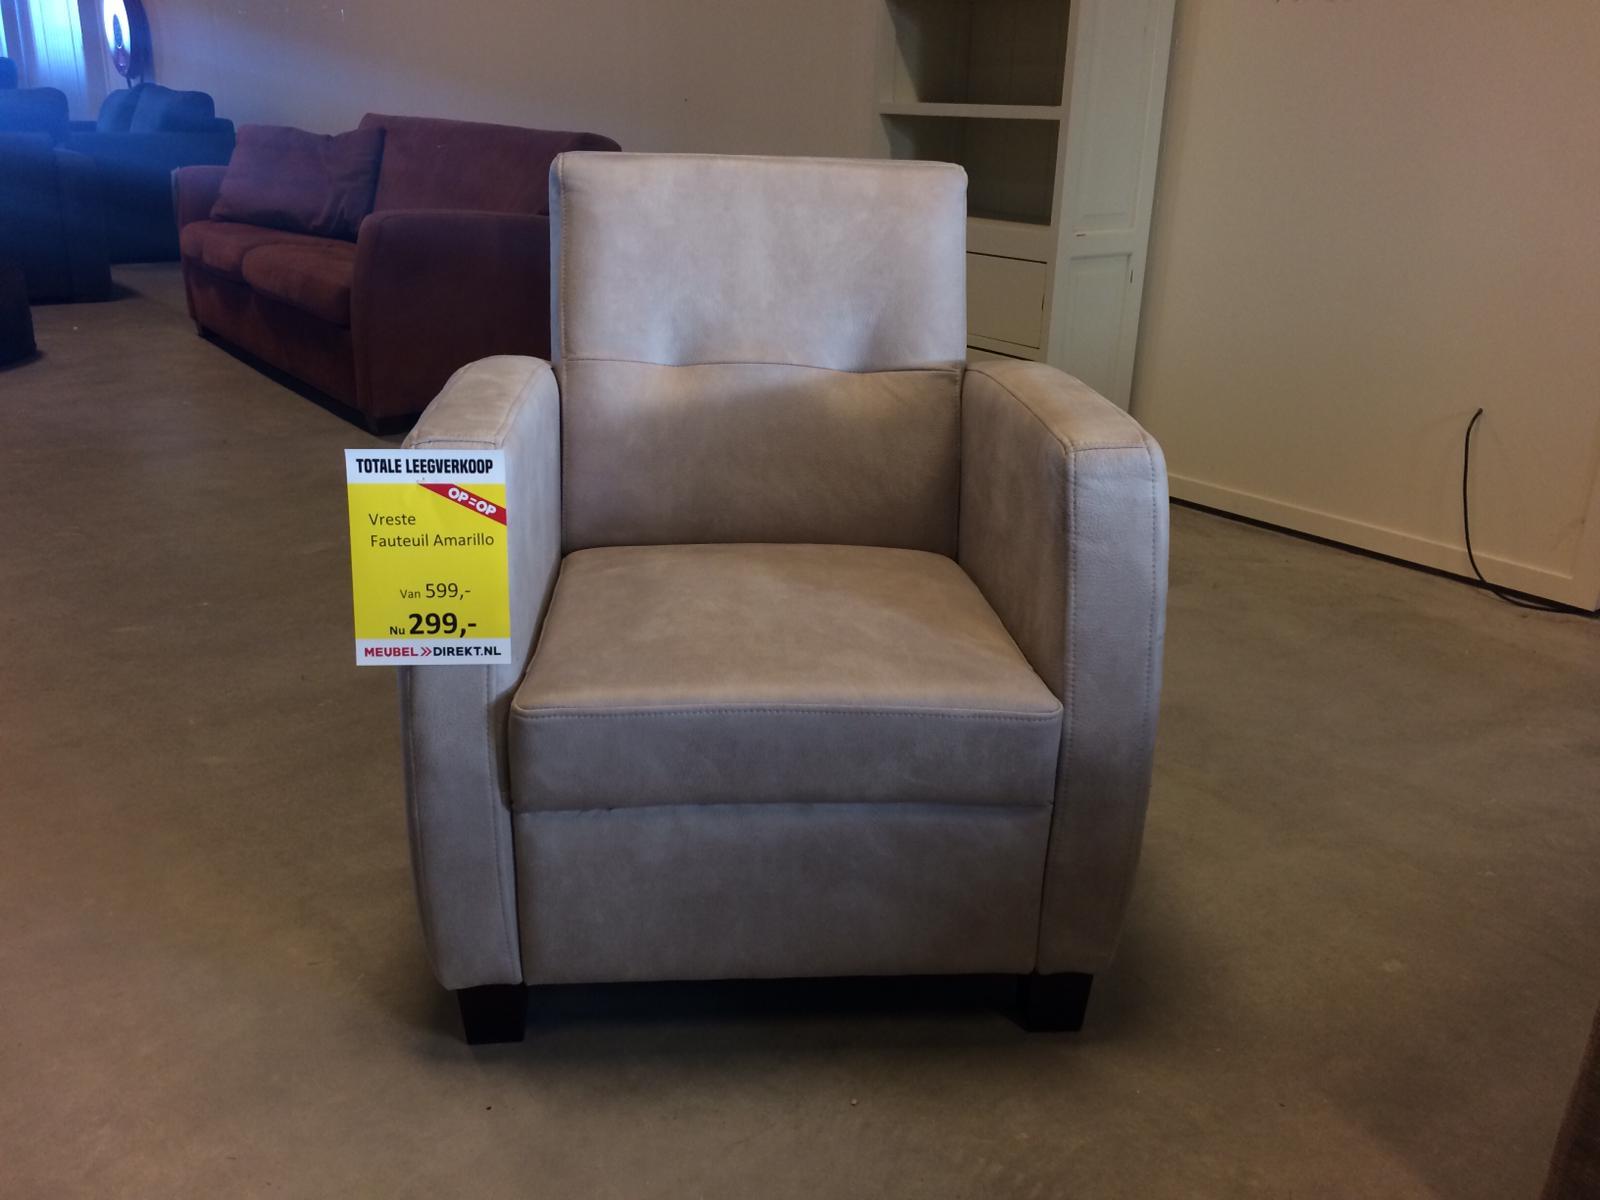 Vreste Amarillo fauteuil